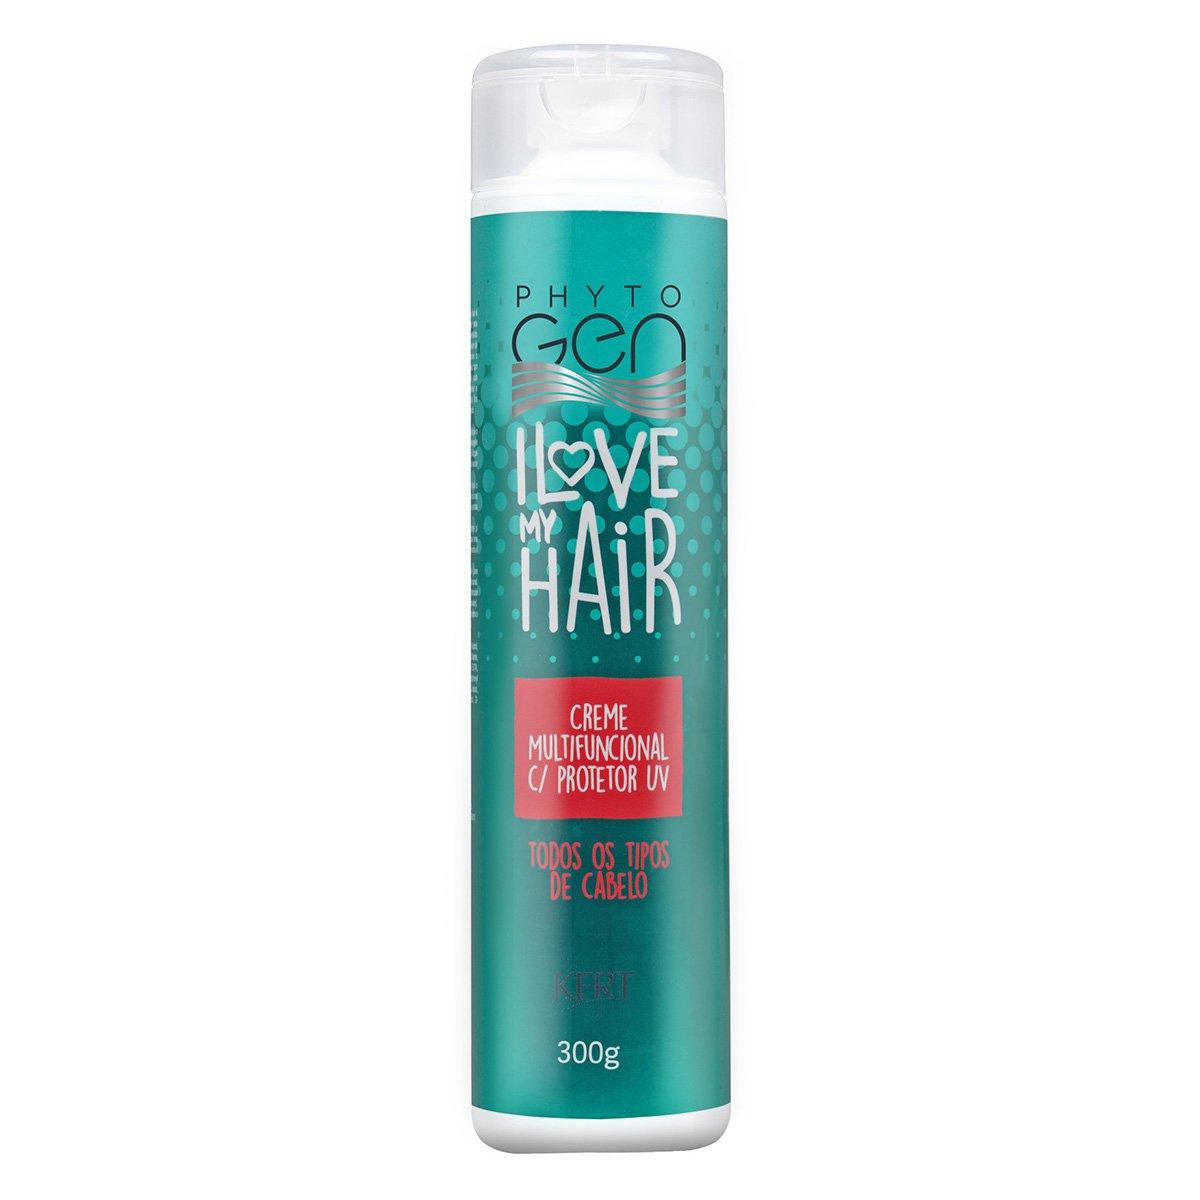 Creme Multifuncional Phytogen I Love My Hair 300g